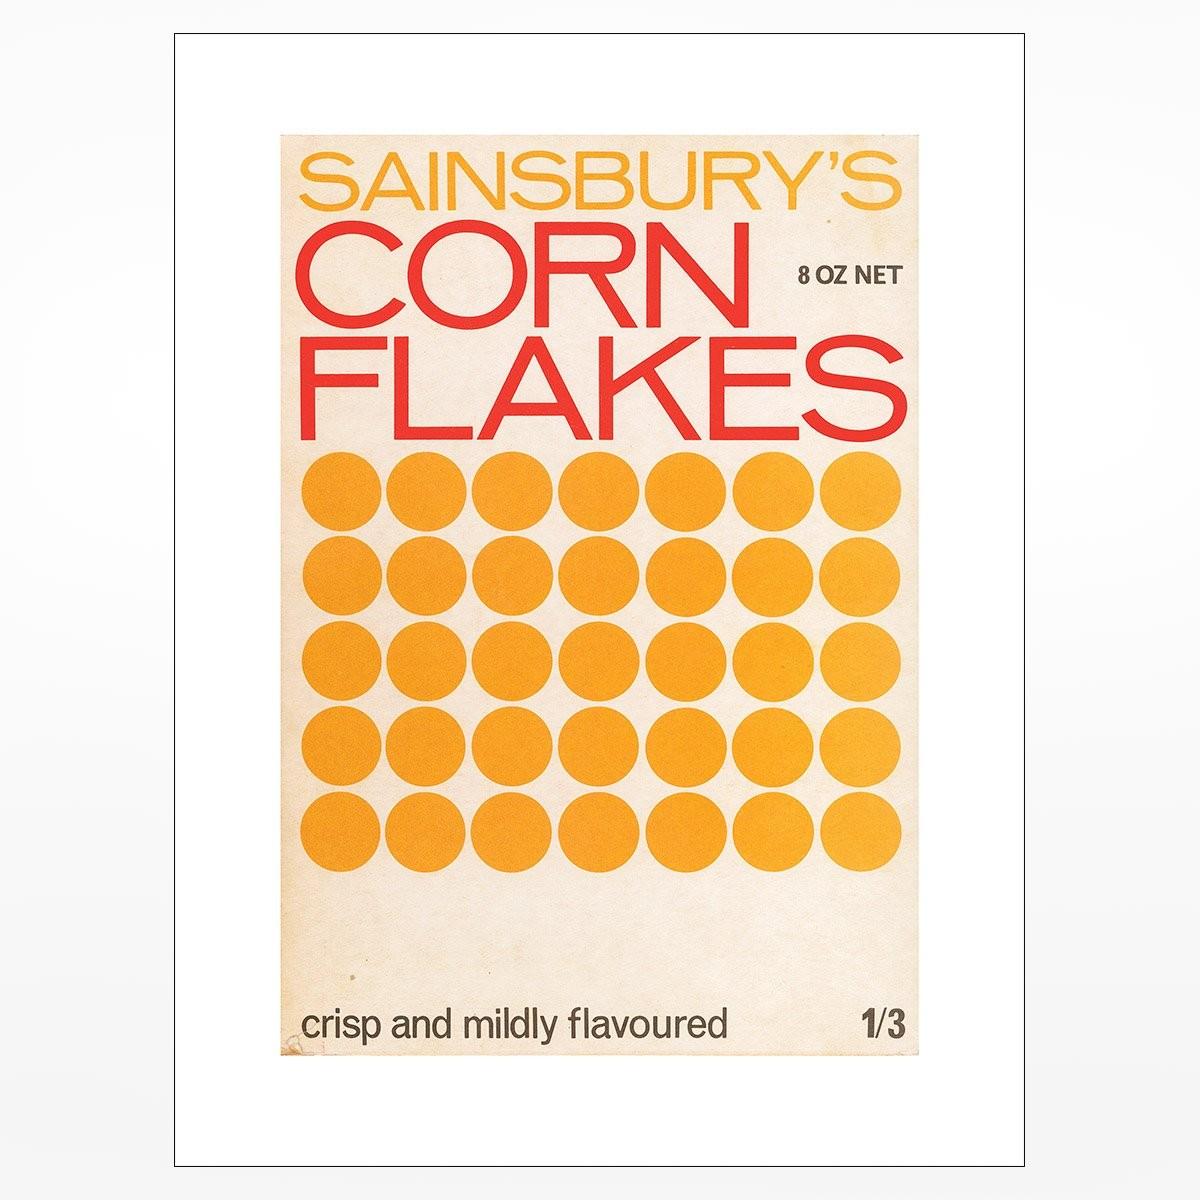 sainsburys-own_cornflakes-print.jpg?v=1571439177